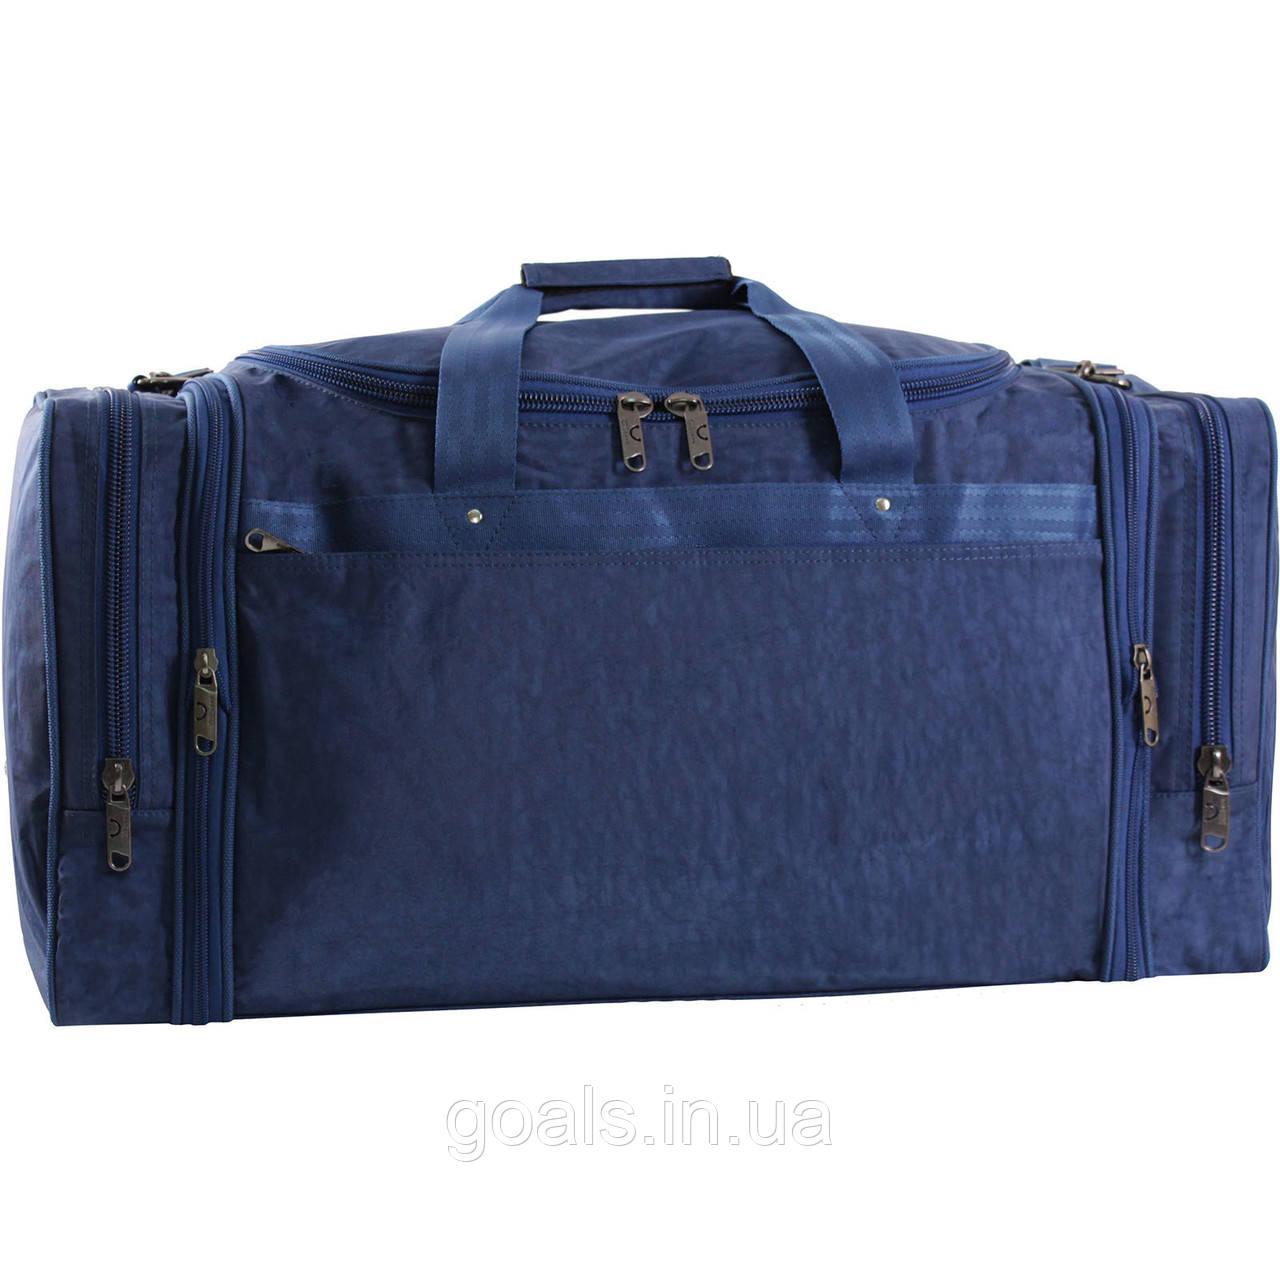 Украина Спортивная сумка Bagland Мюнхен 59 л. Синий (0032570)